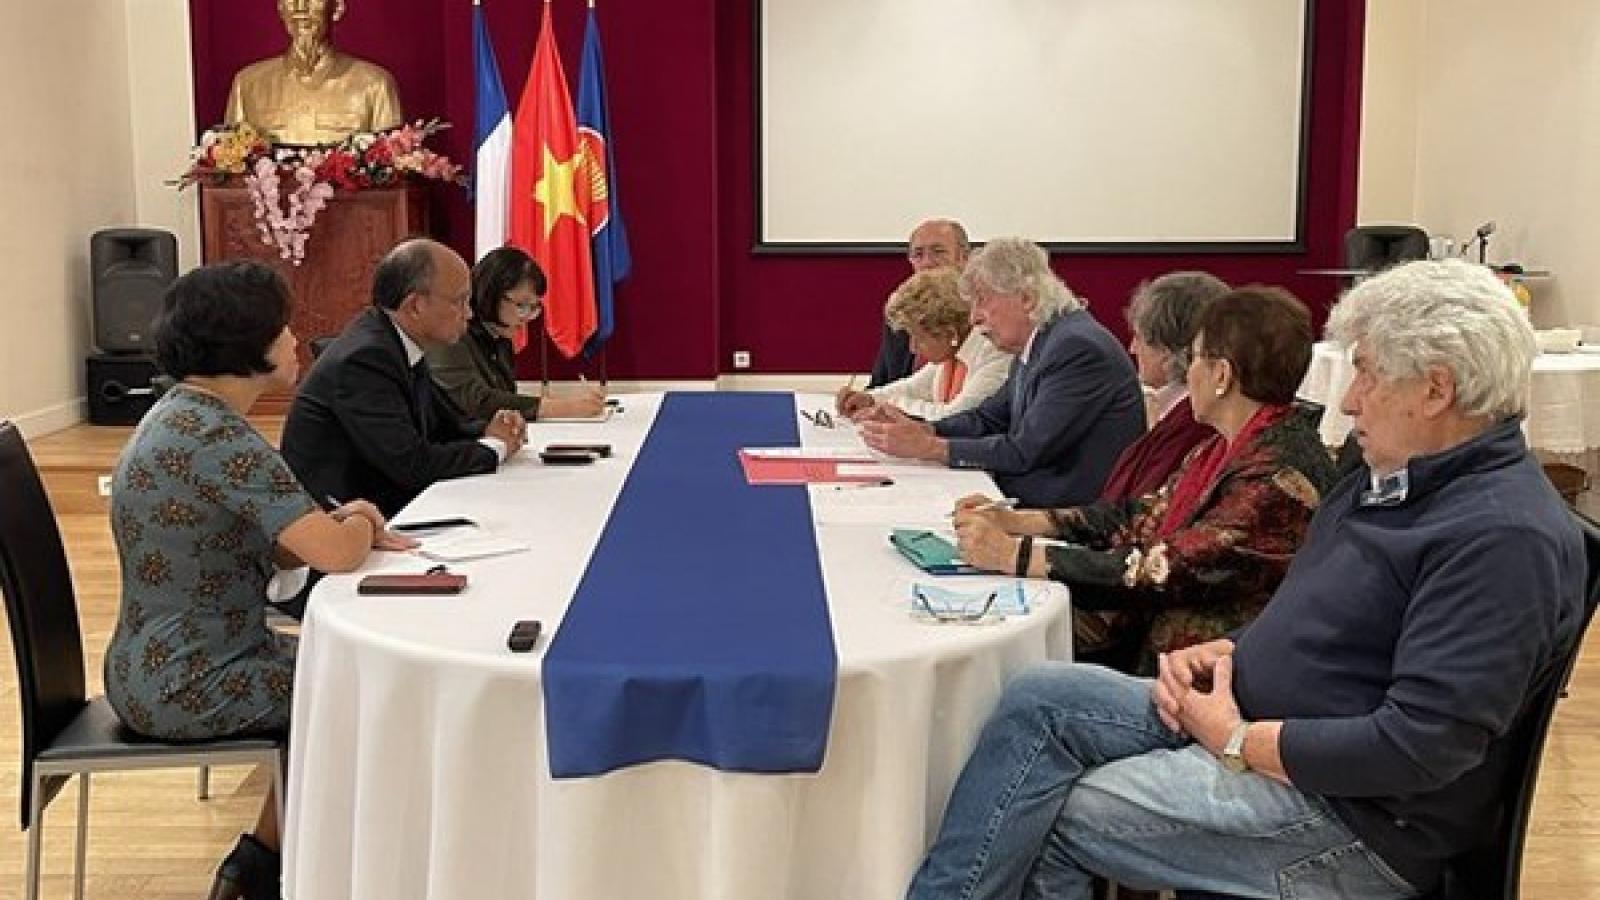 Association hailed for helping strengthen Vietnam-France friendship